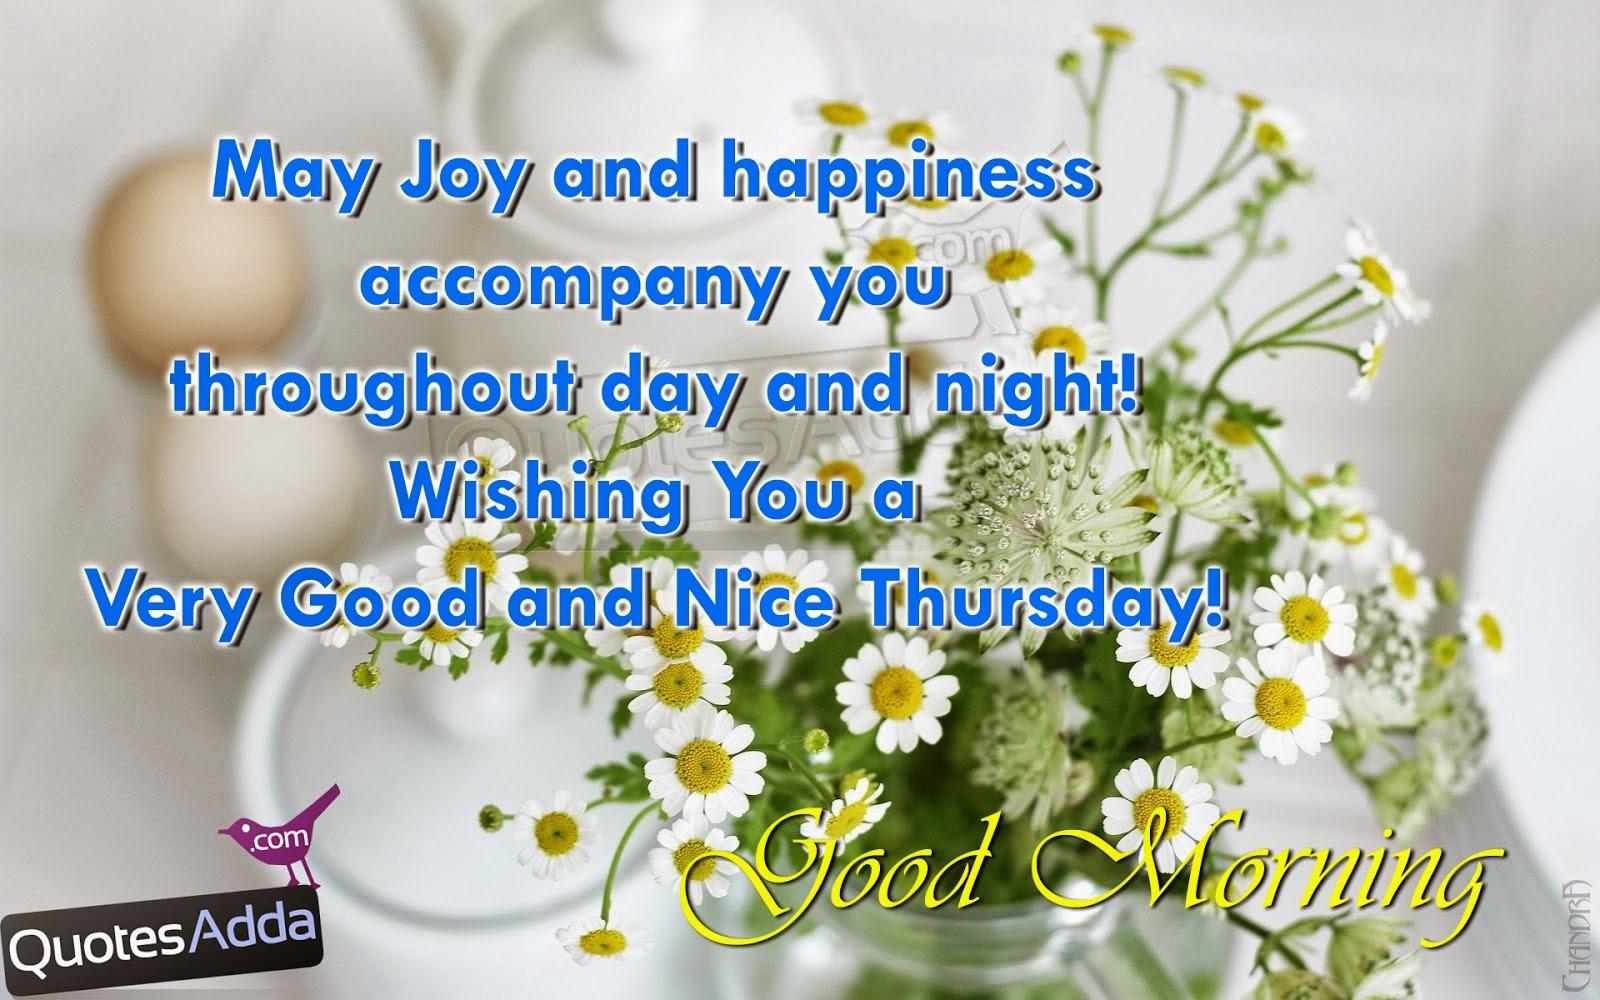 Wallpaper download good - Good Morning Quotes Hd Wallpaper Best Good Morning Quotes Download Hd